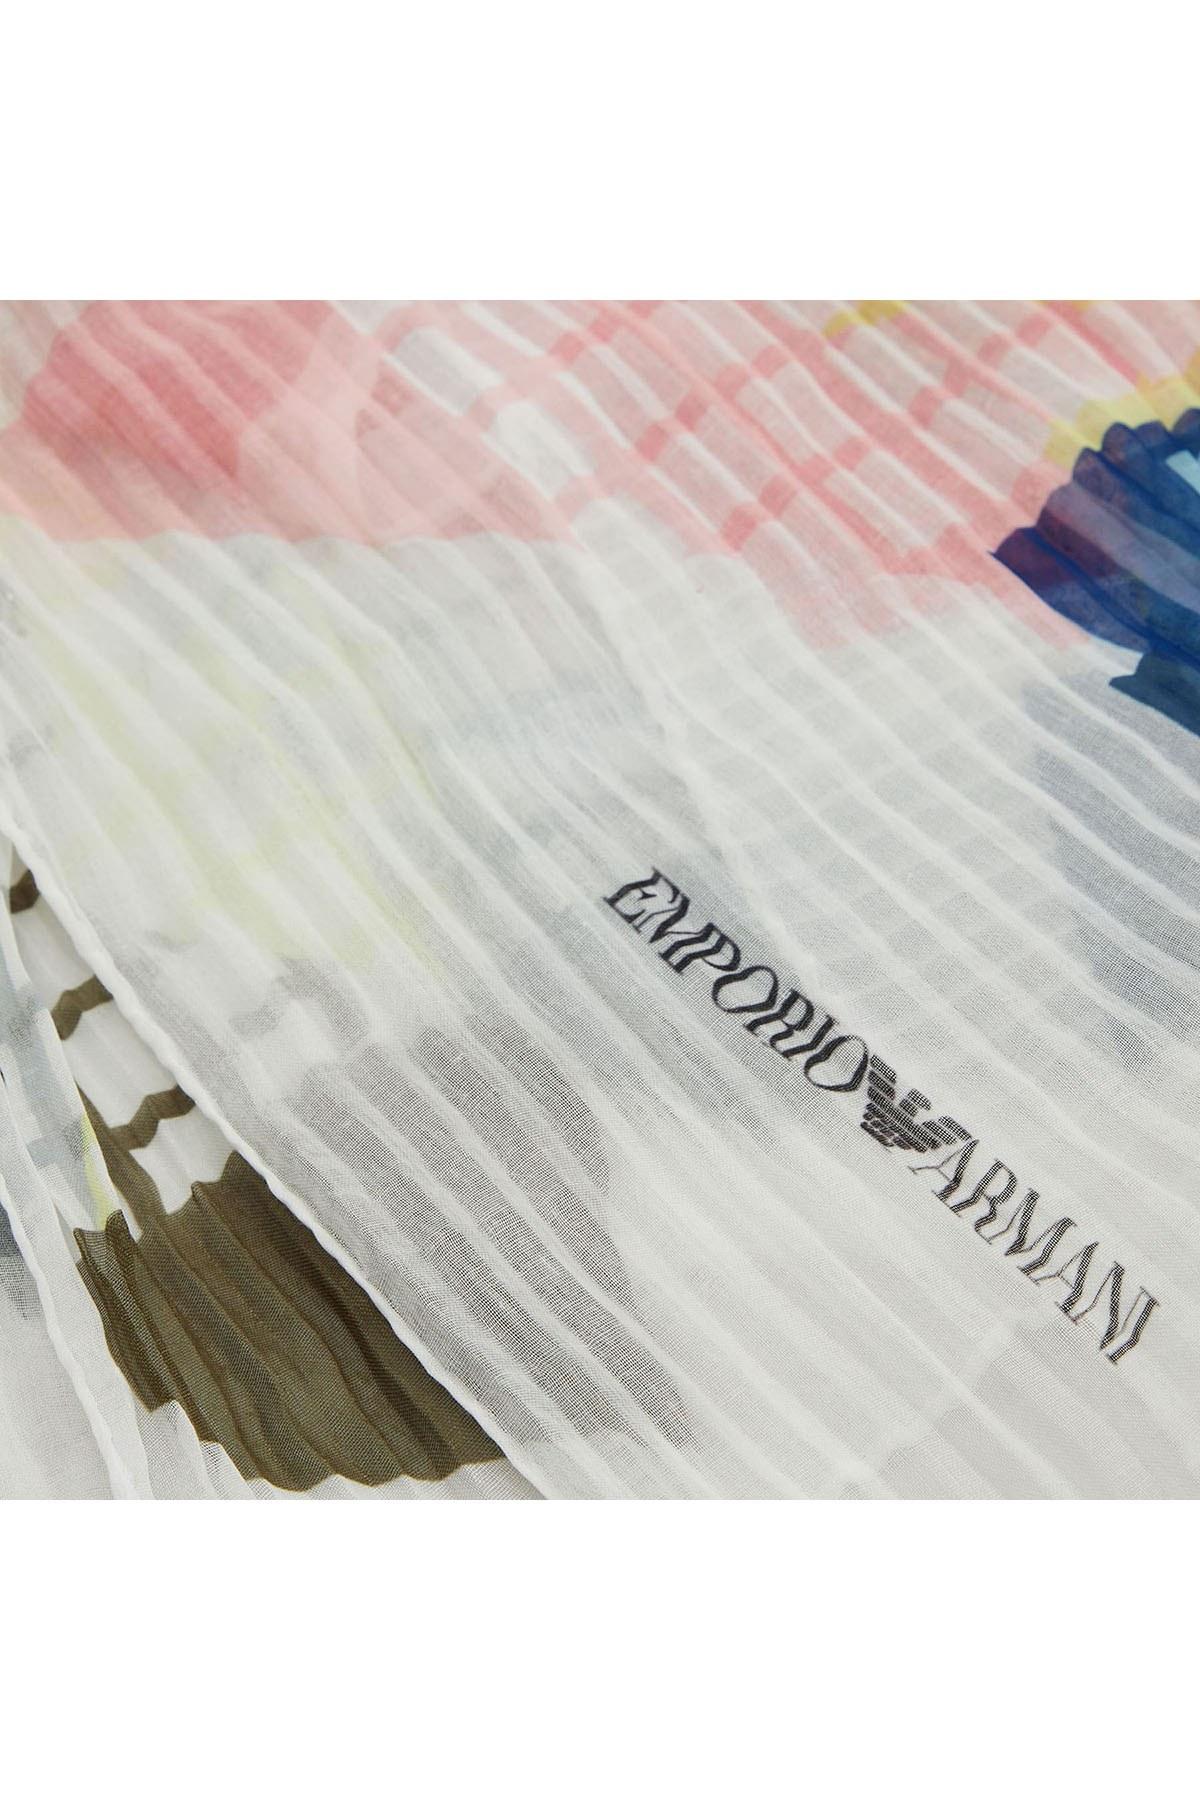 Emporio Armani Kadın Şal 635386 9P356 00410 BEYAZ